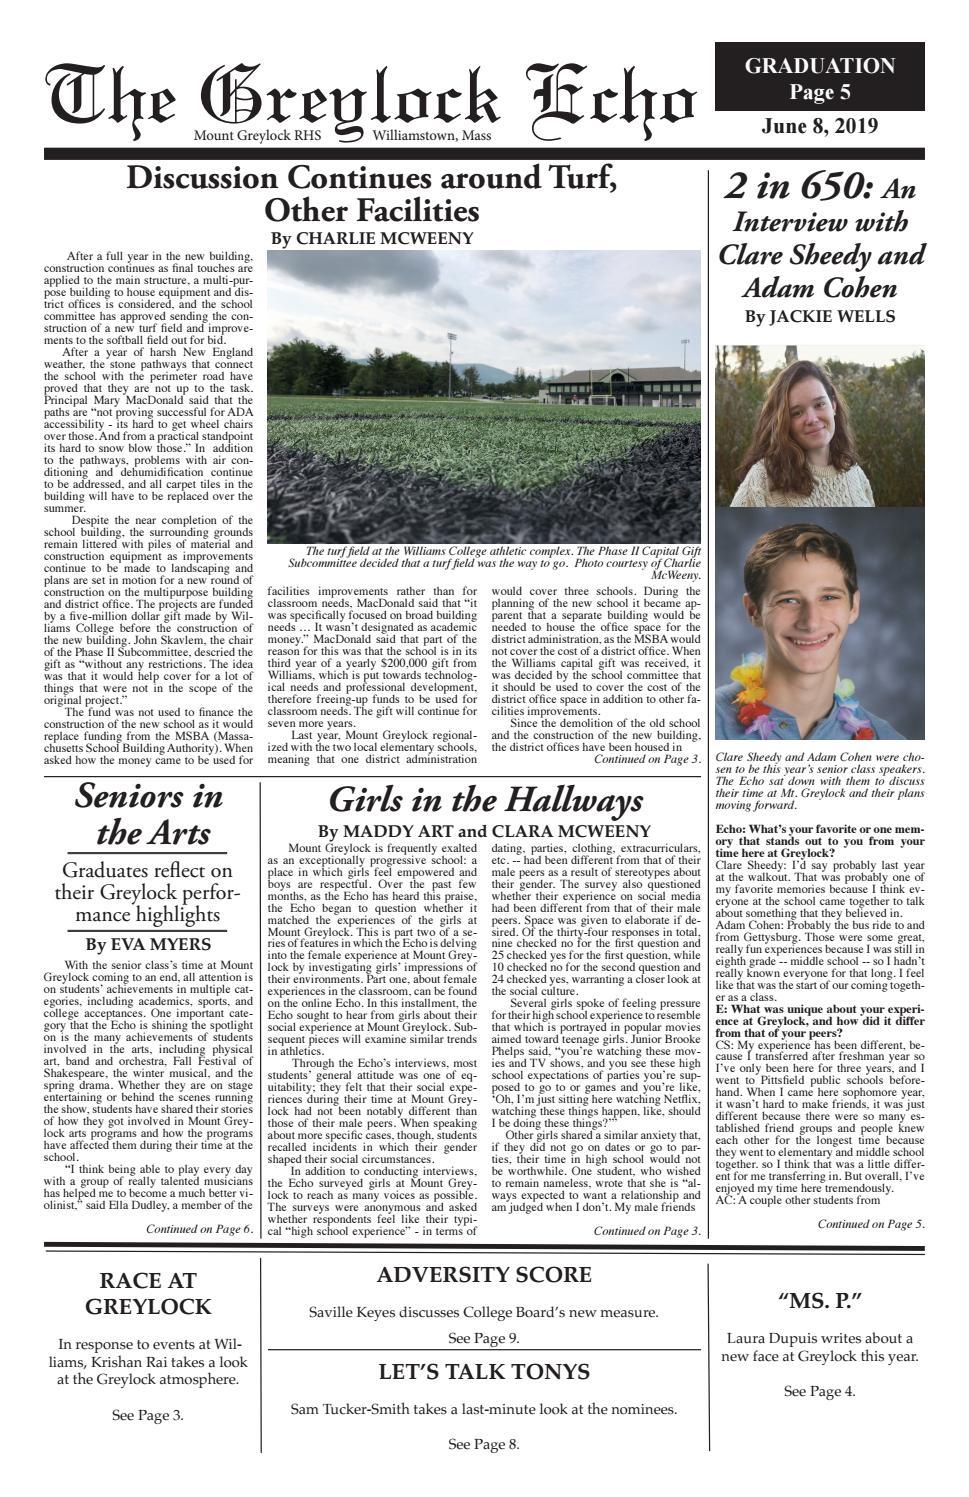 The Greylock Echo: Graduation Issue by mountgreylockecho - issuu